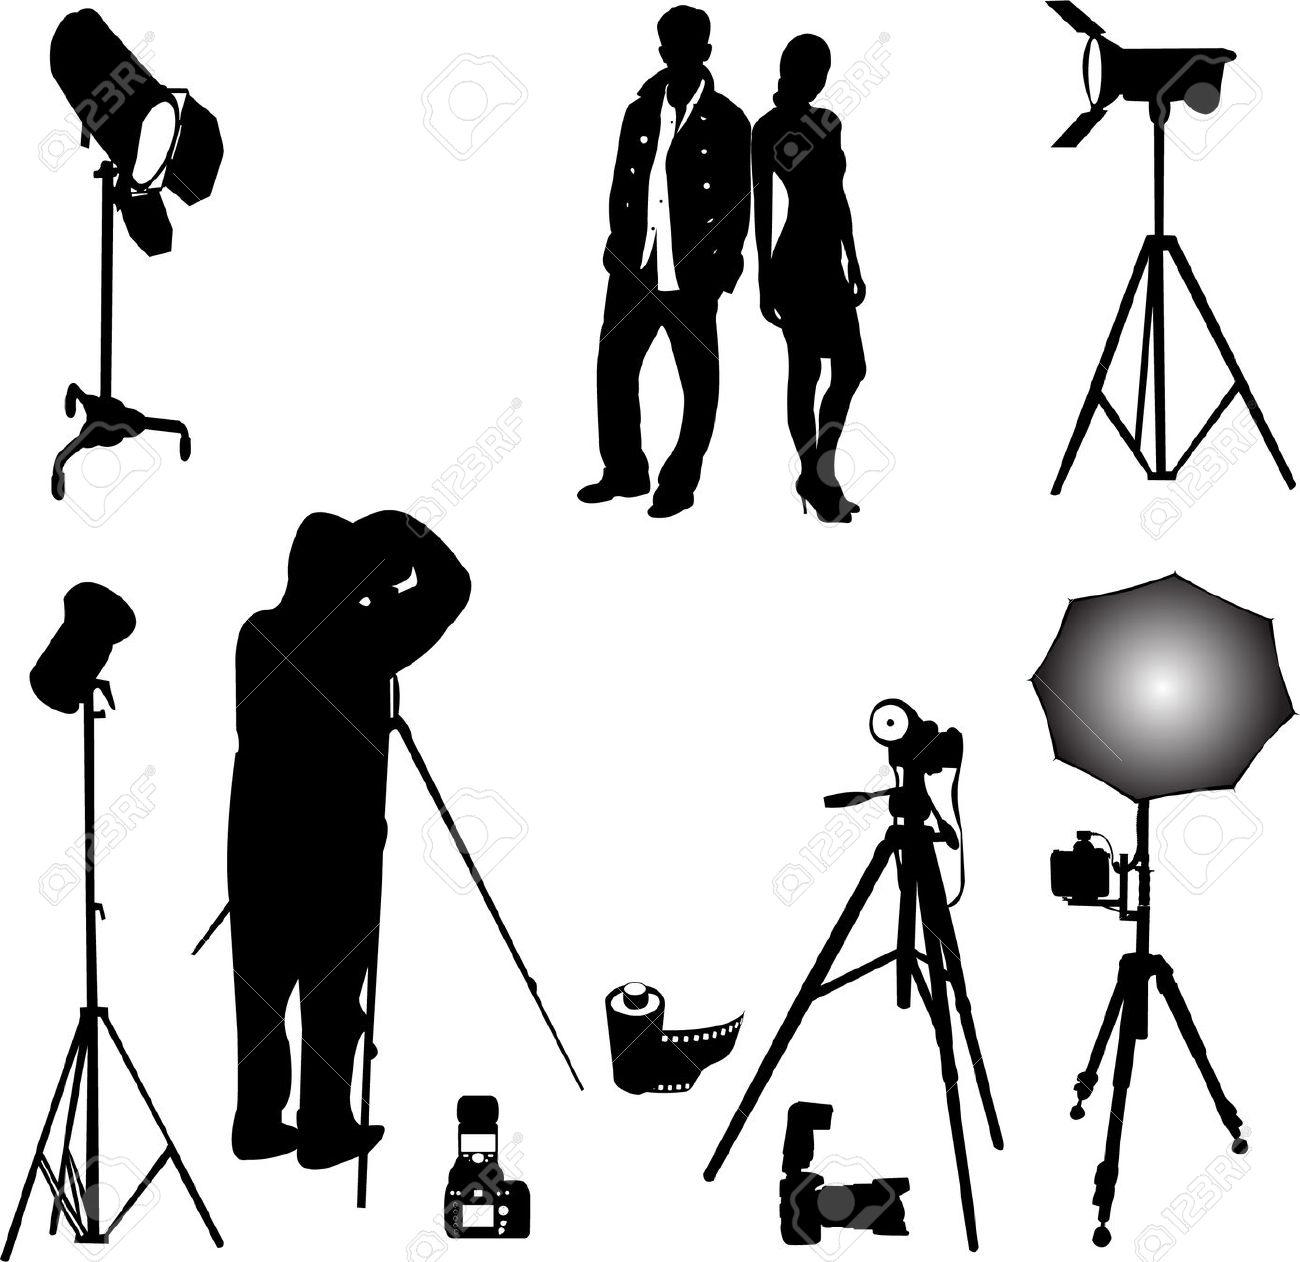 Camera studio clipart stock photography studio: photo | Clipart Panda - Free Clipart Images stock